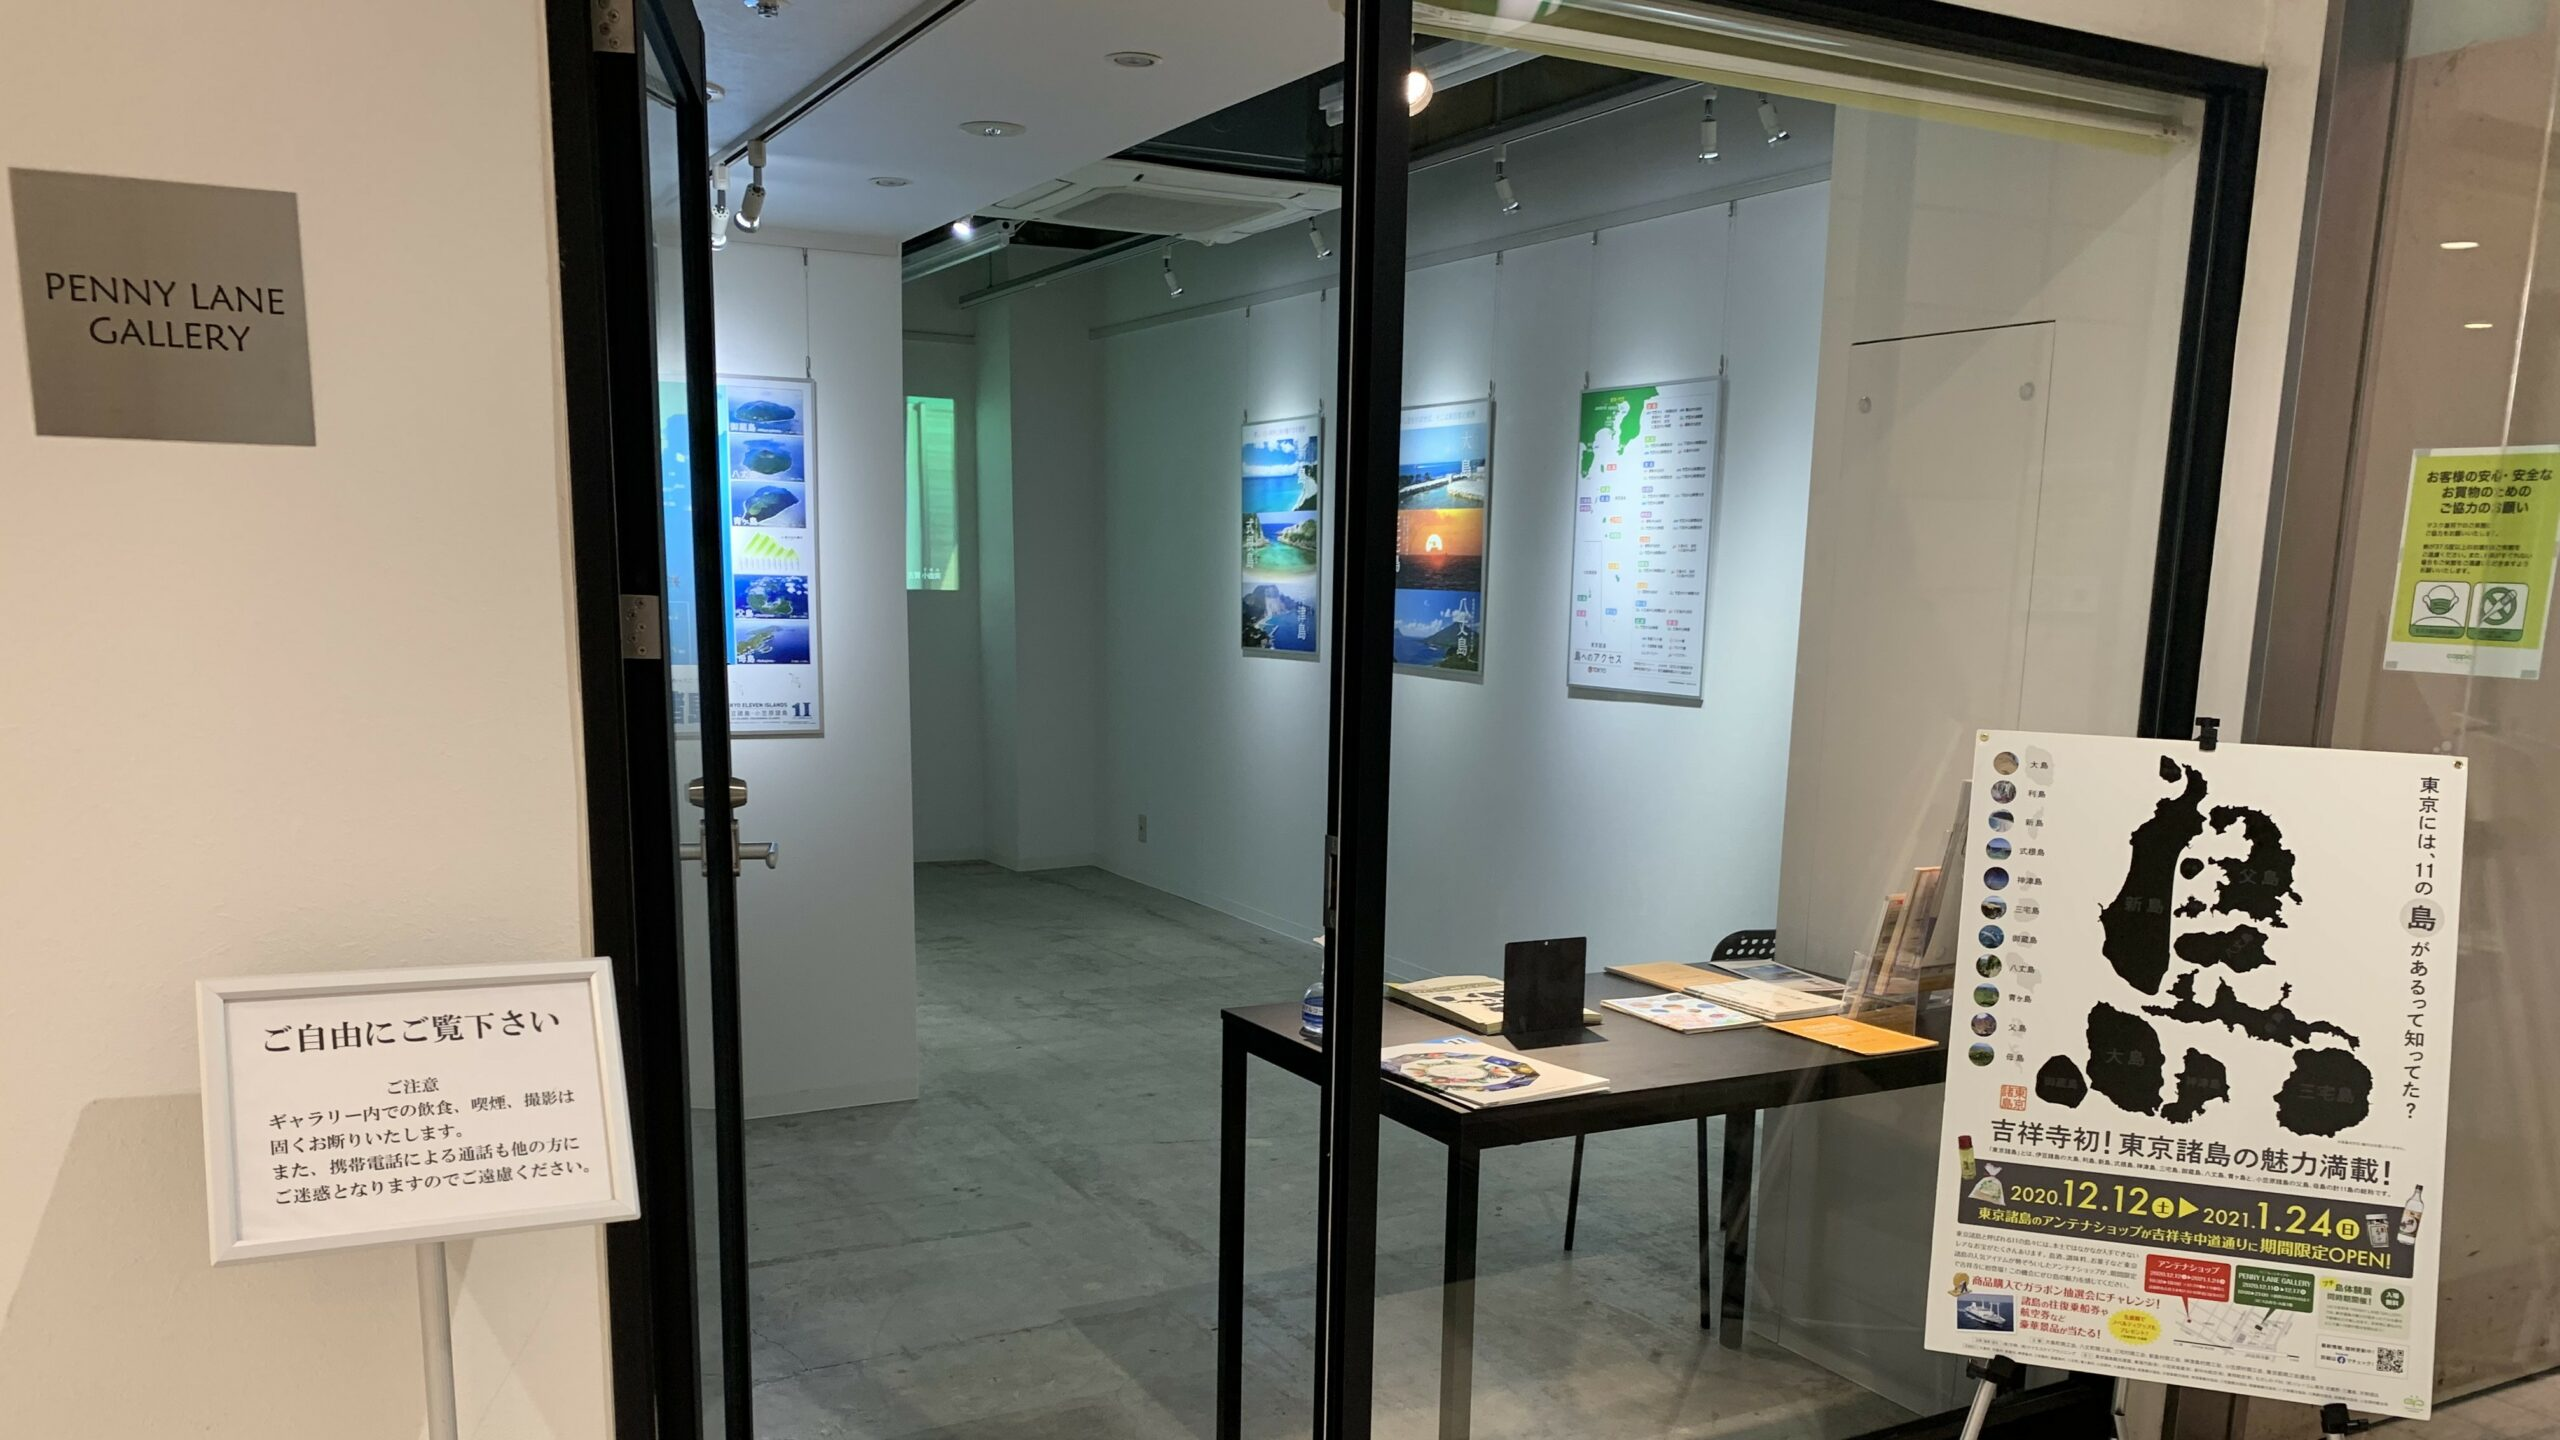 PENNY LANE GALLERYでの「 プチ島体験展 」開催スタート!